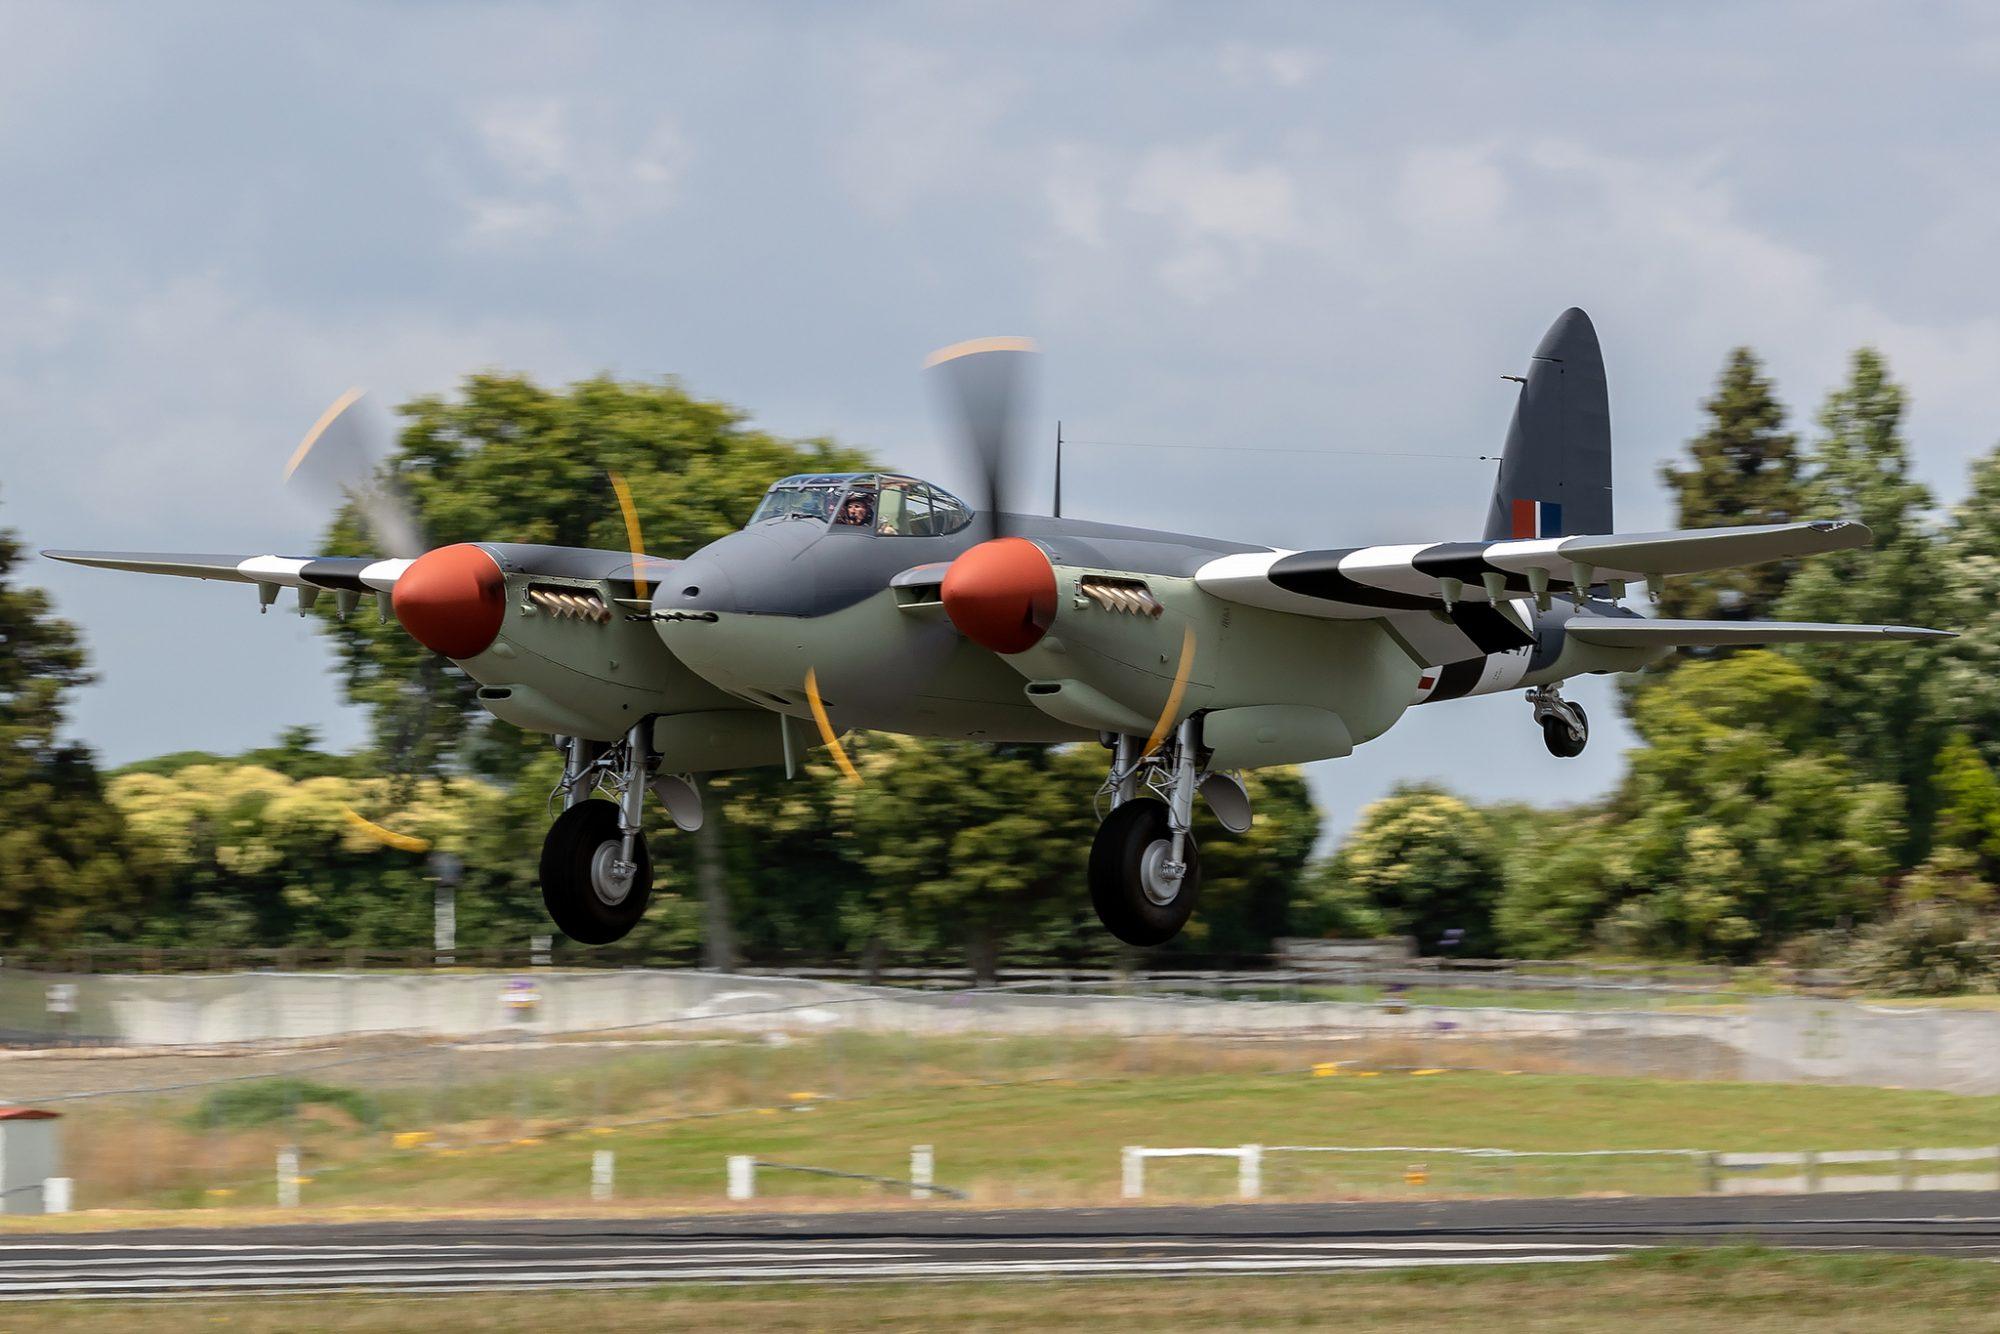 Mosquito B.VI PZ474 ZK-BCF © Stuart Russell